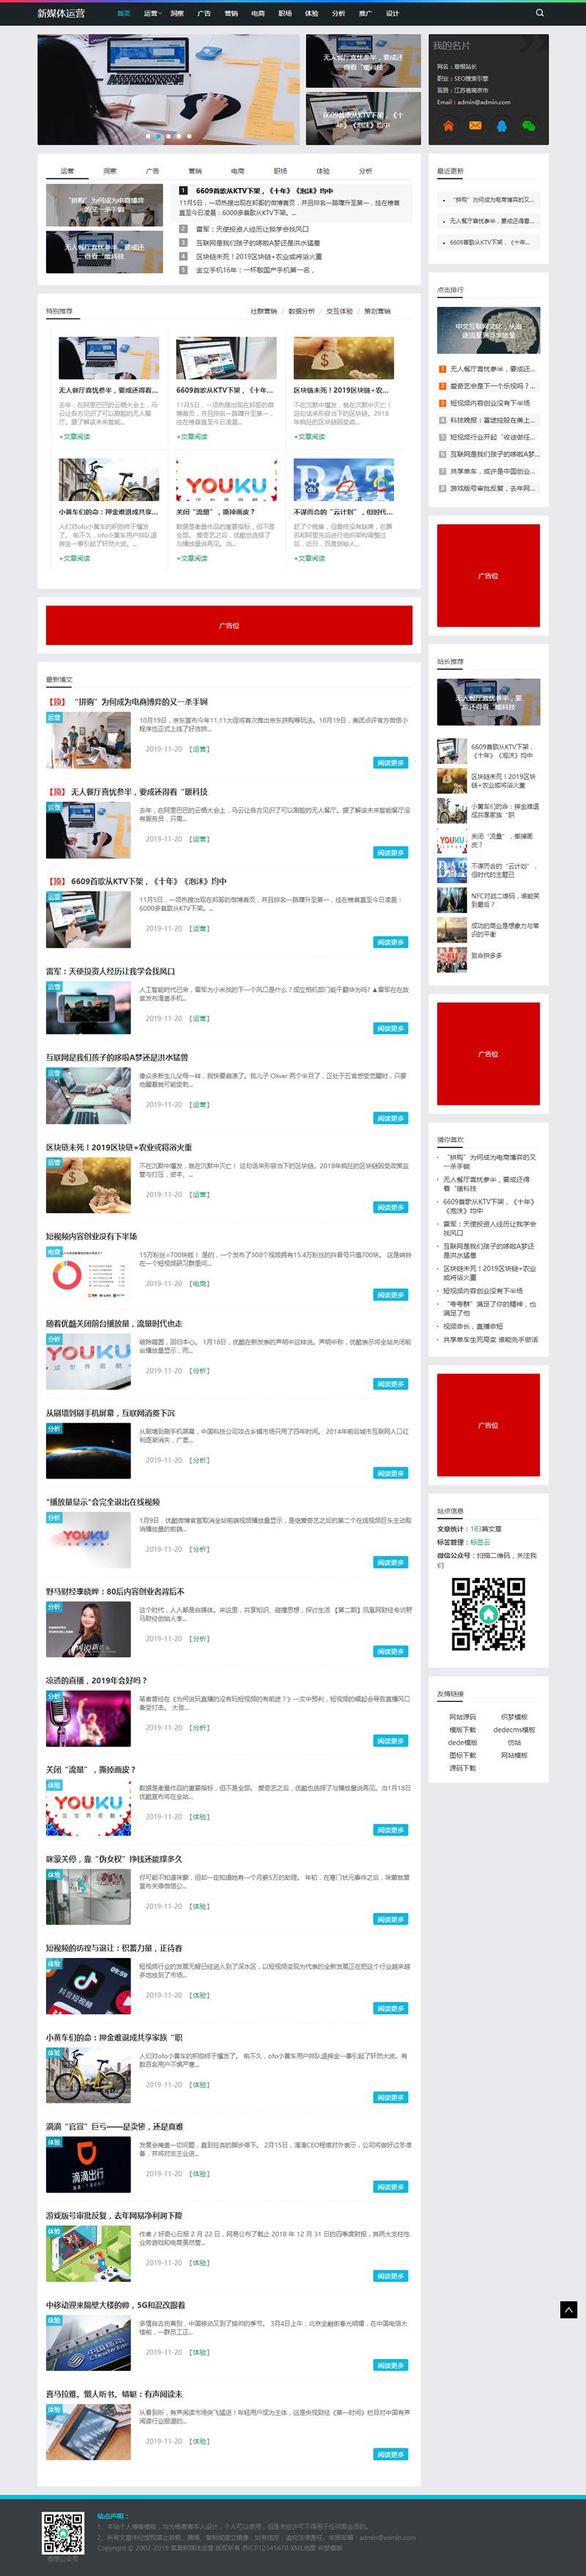 【dedecms】自适应WAP新媒体运营科技资讯类dedecms网站模板-爱资源分享